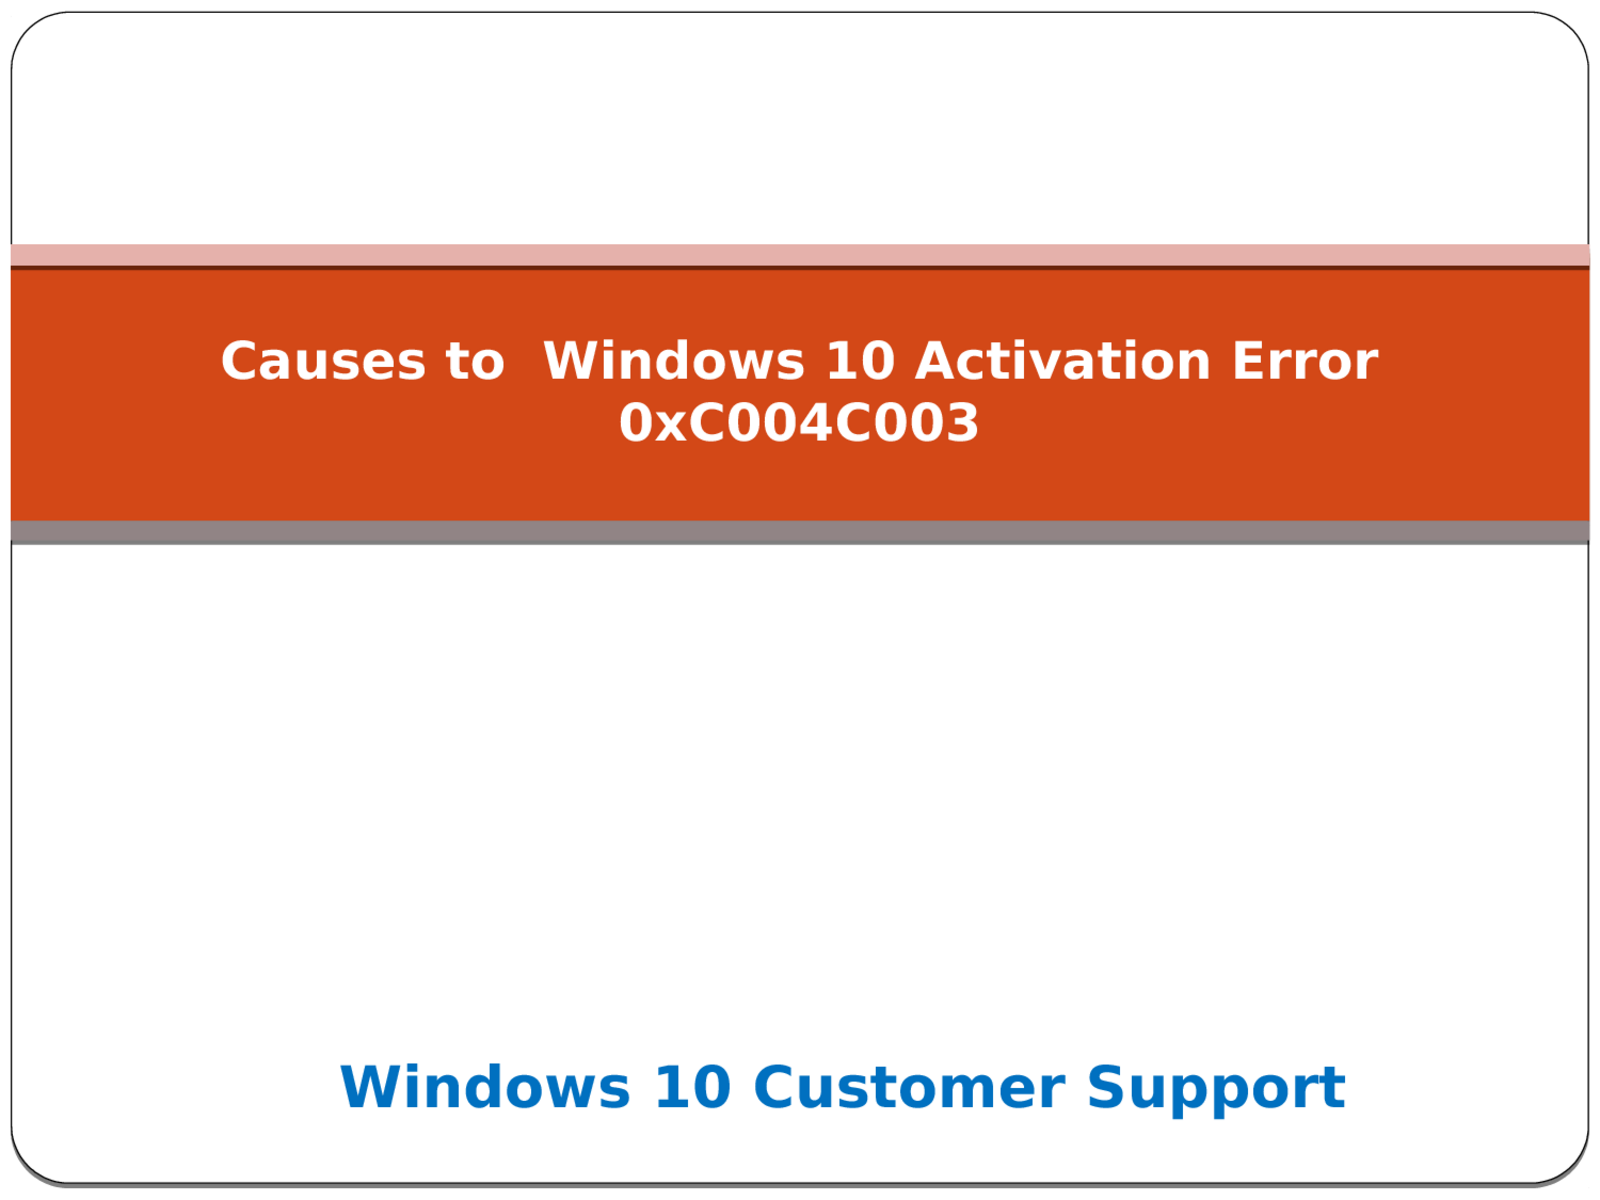 Solution to Windows 10 Activation Error 0xC004C003